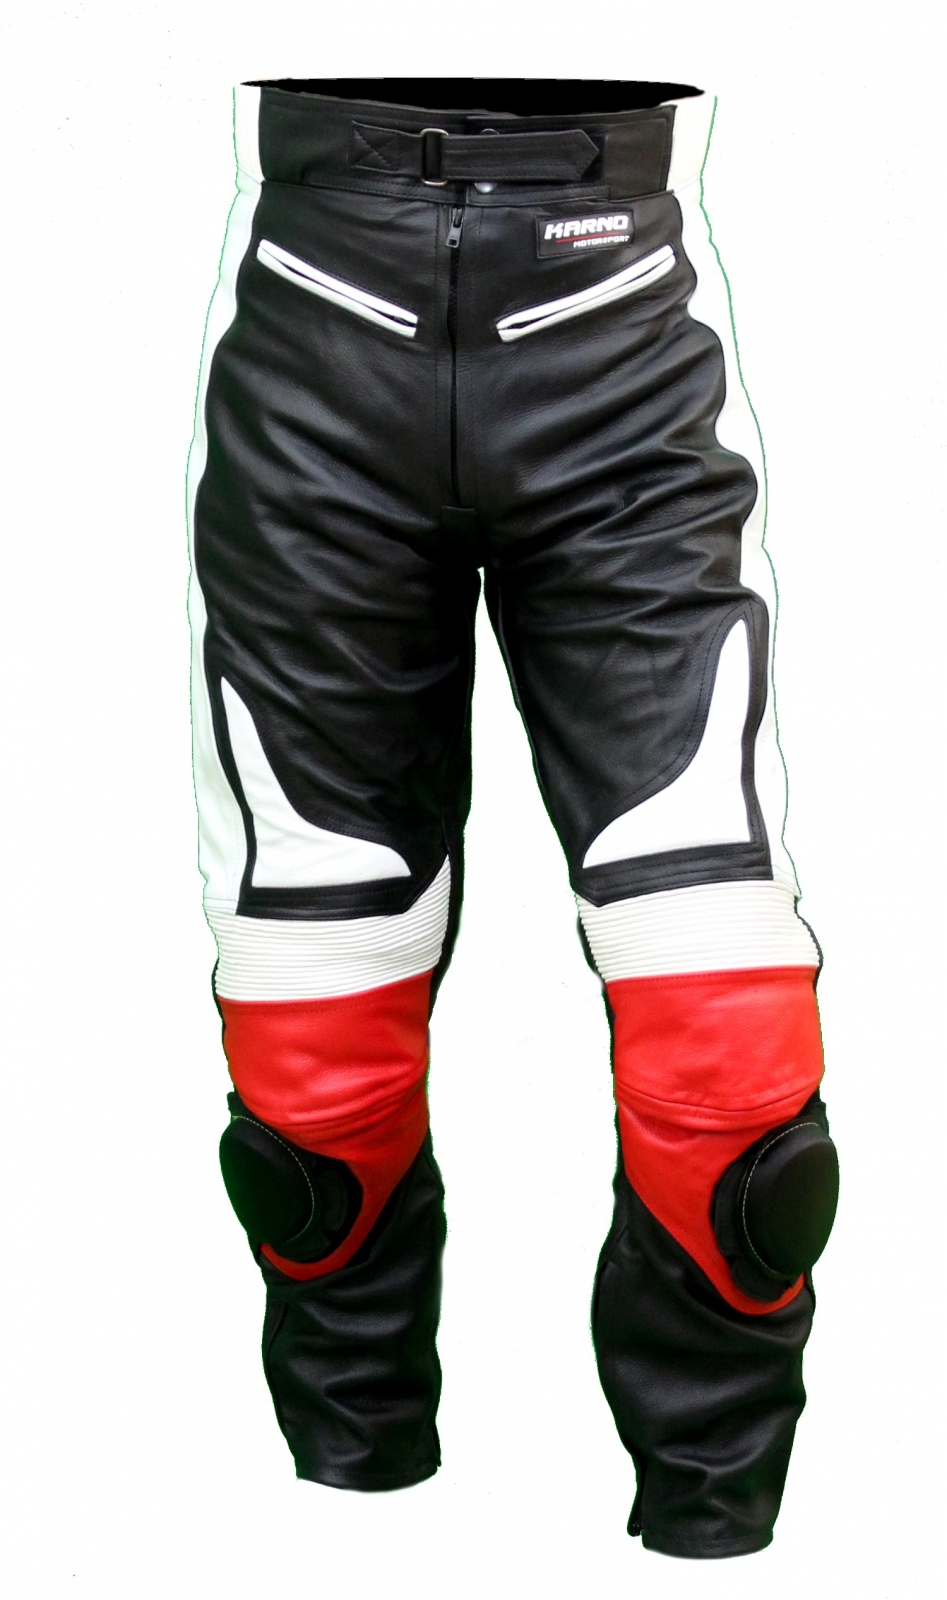 kc300 pantalon moto quad racing cuir noir et rouge karno. Black Bedroom Furniture Sets. Home Design Ideas